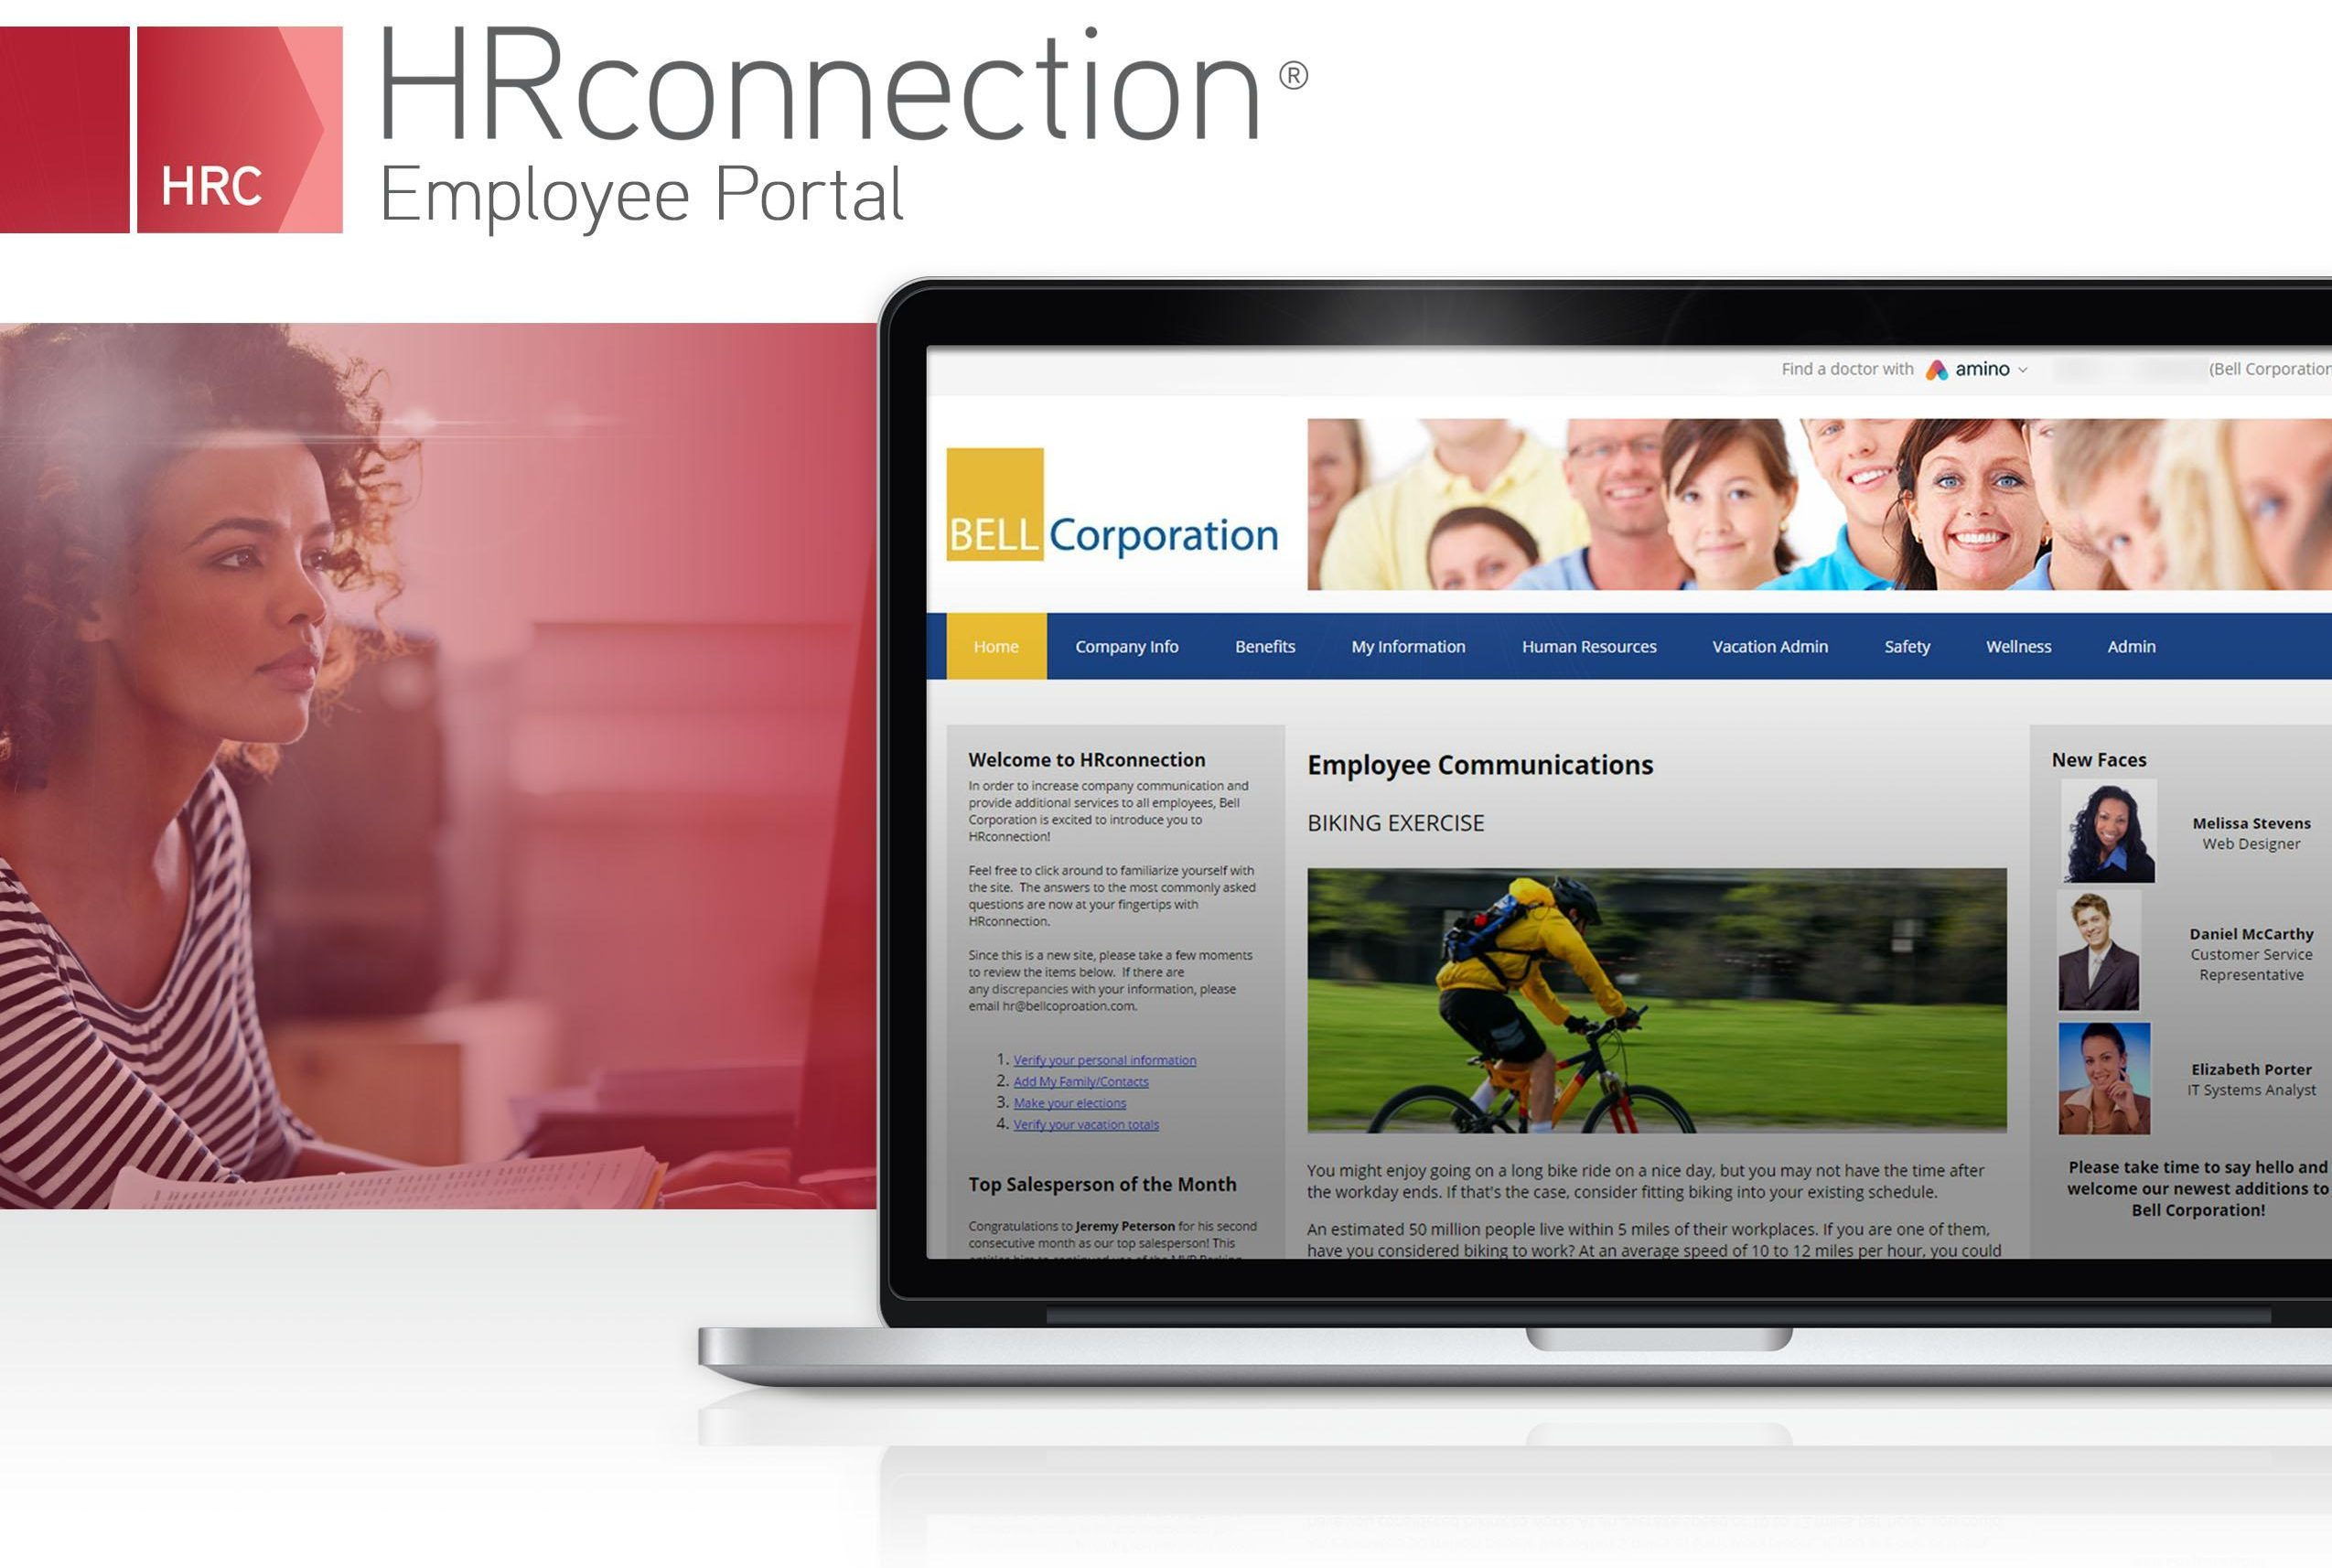 HR Connection